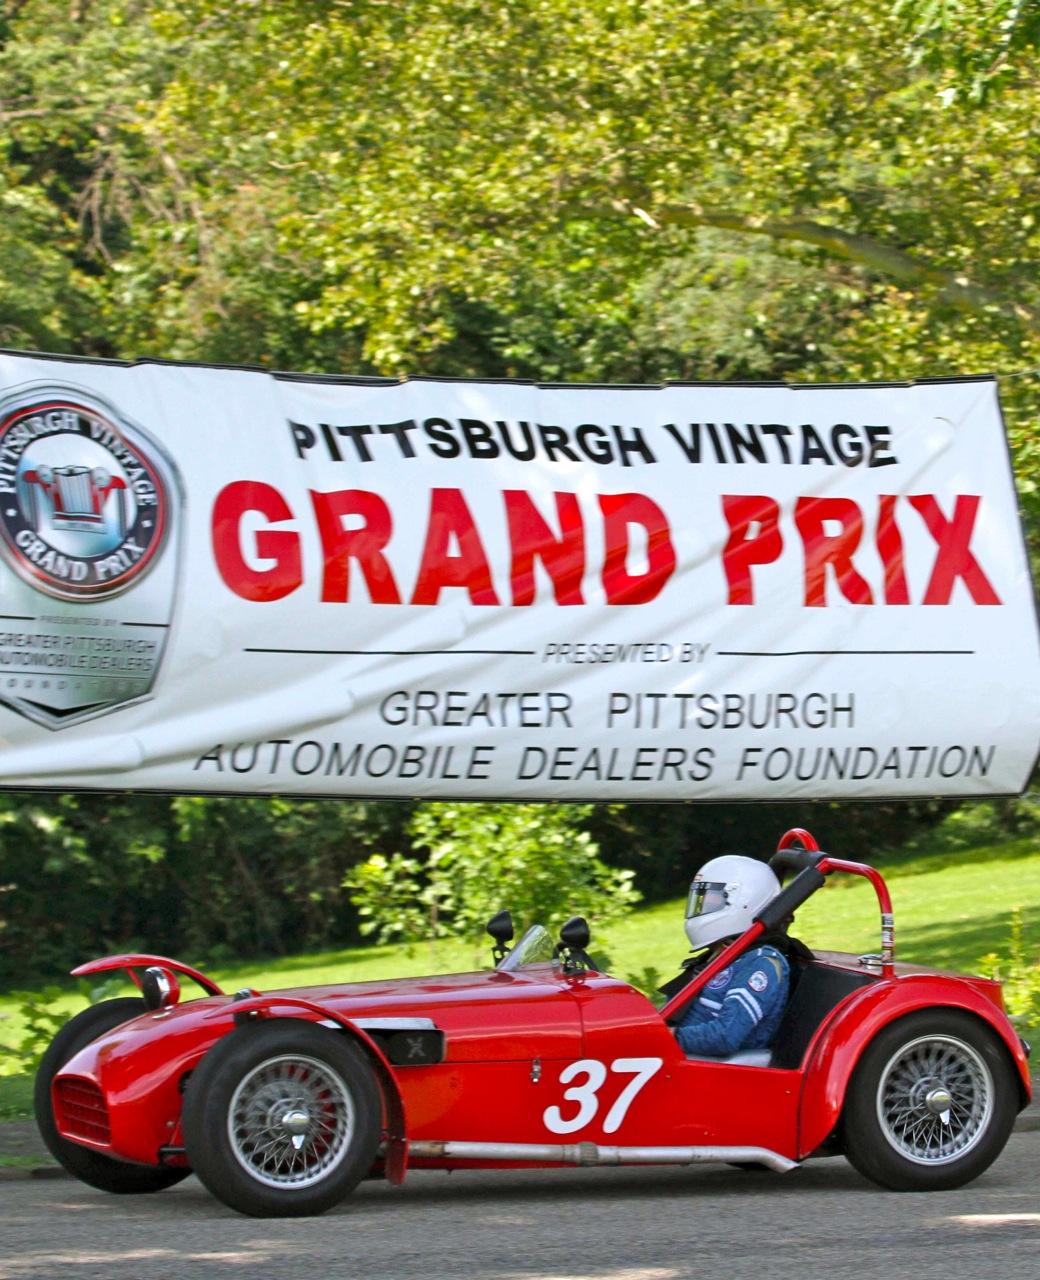 SCHENLEY PARK: PITTSBURGH VINTAGE GRAND PRIX! - Car Guy Chronicles